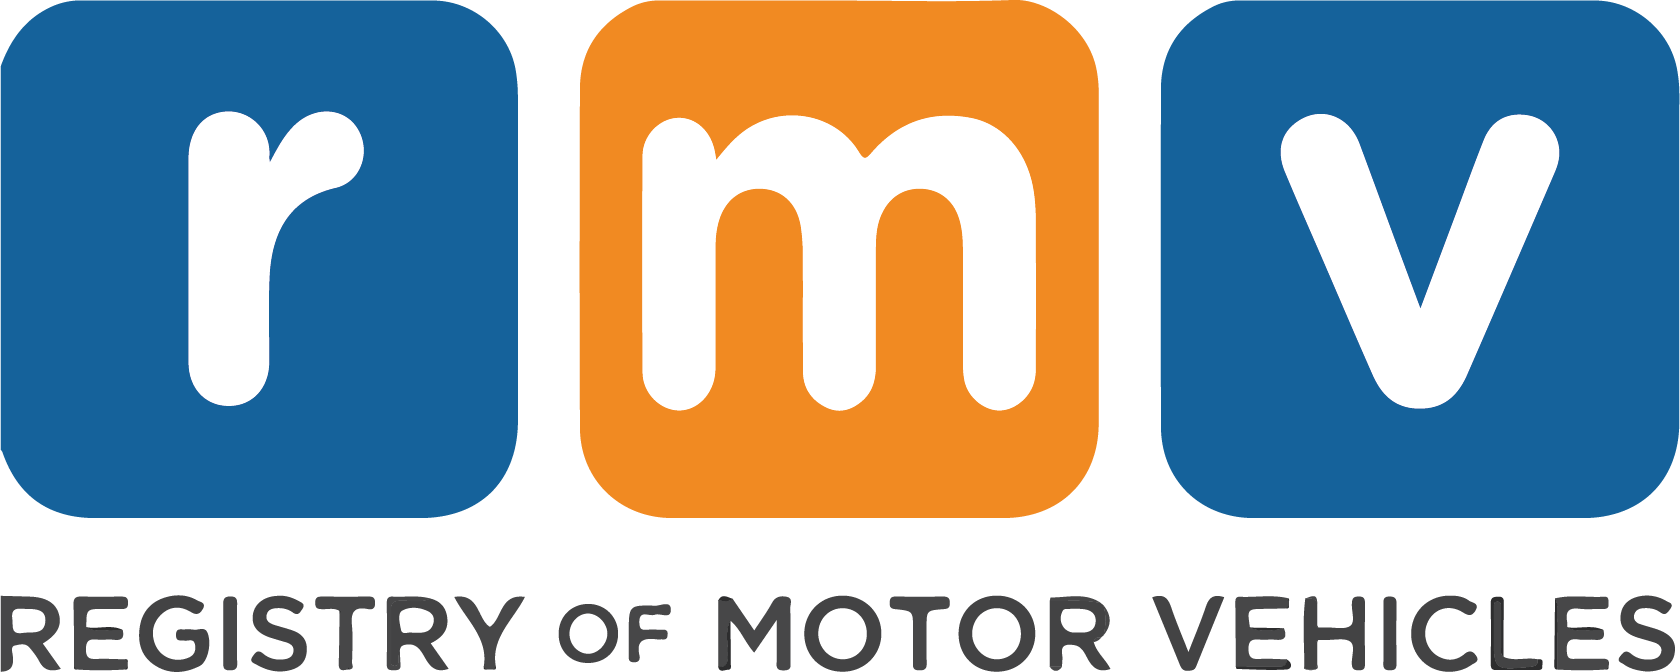 Registry of Motor Vehicles